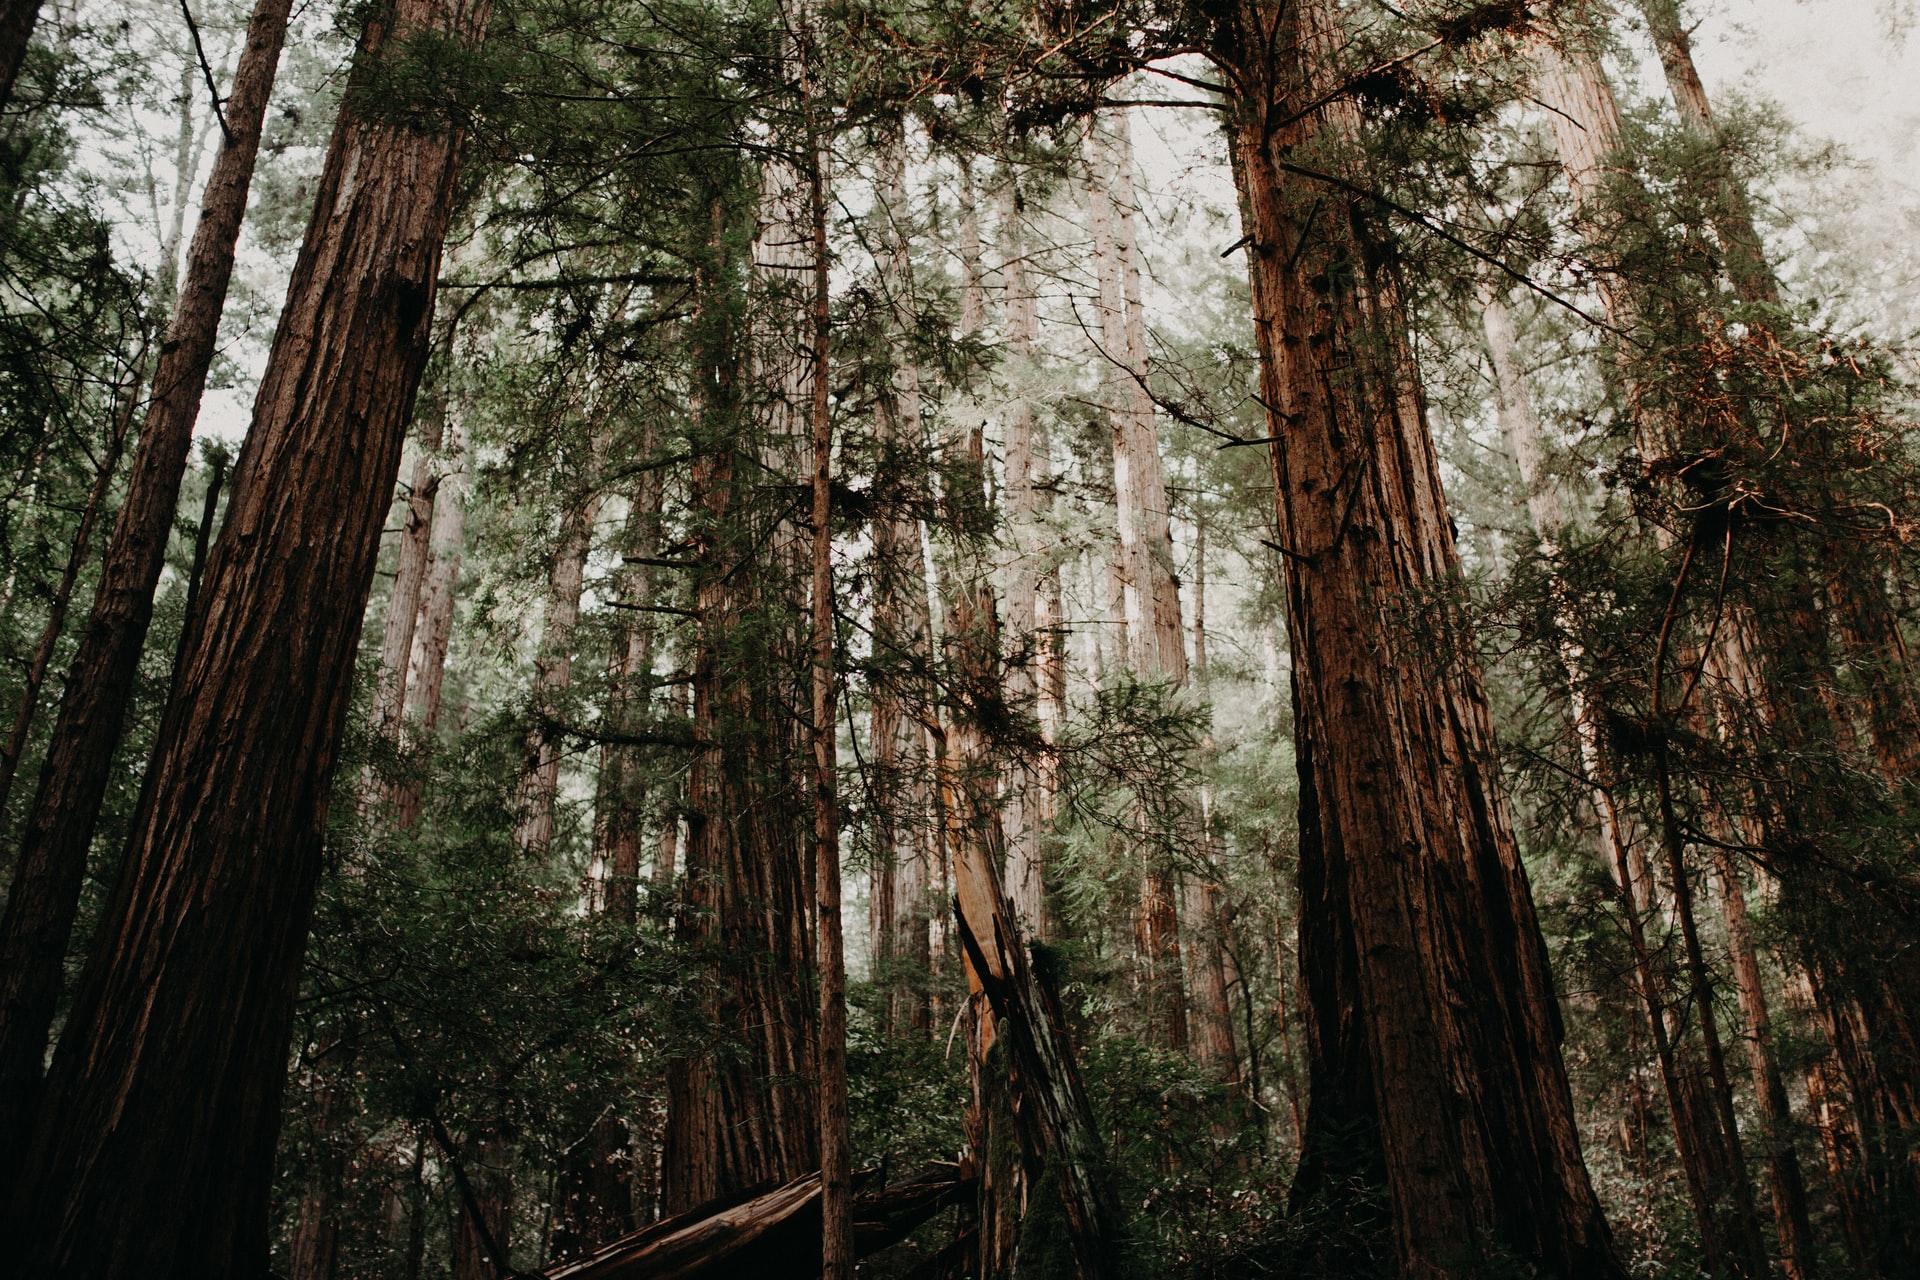 Redwood trees growing tall in Muir Woods near SF